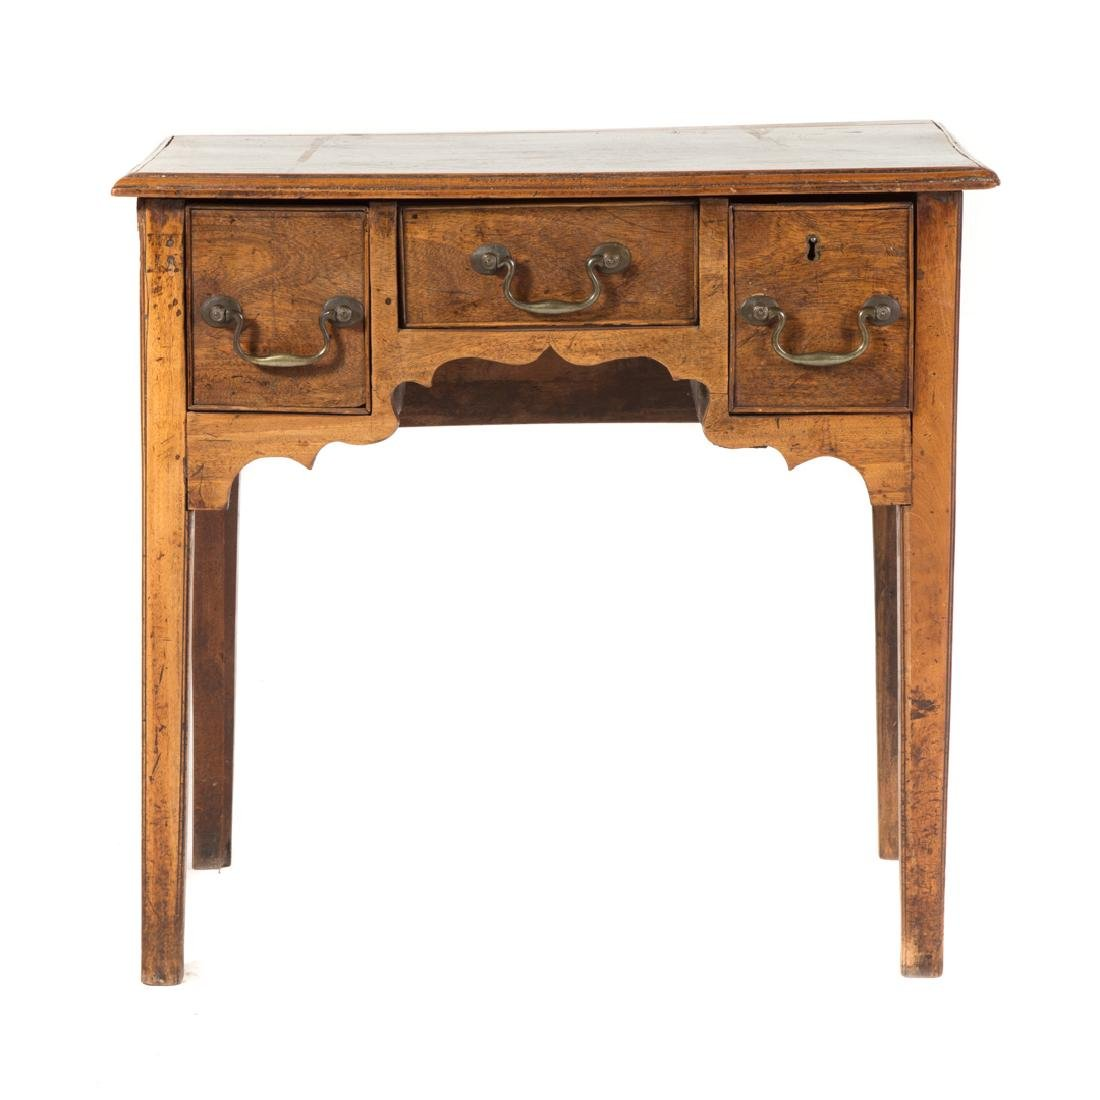 George III walnut dressing table